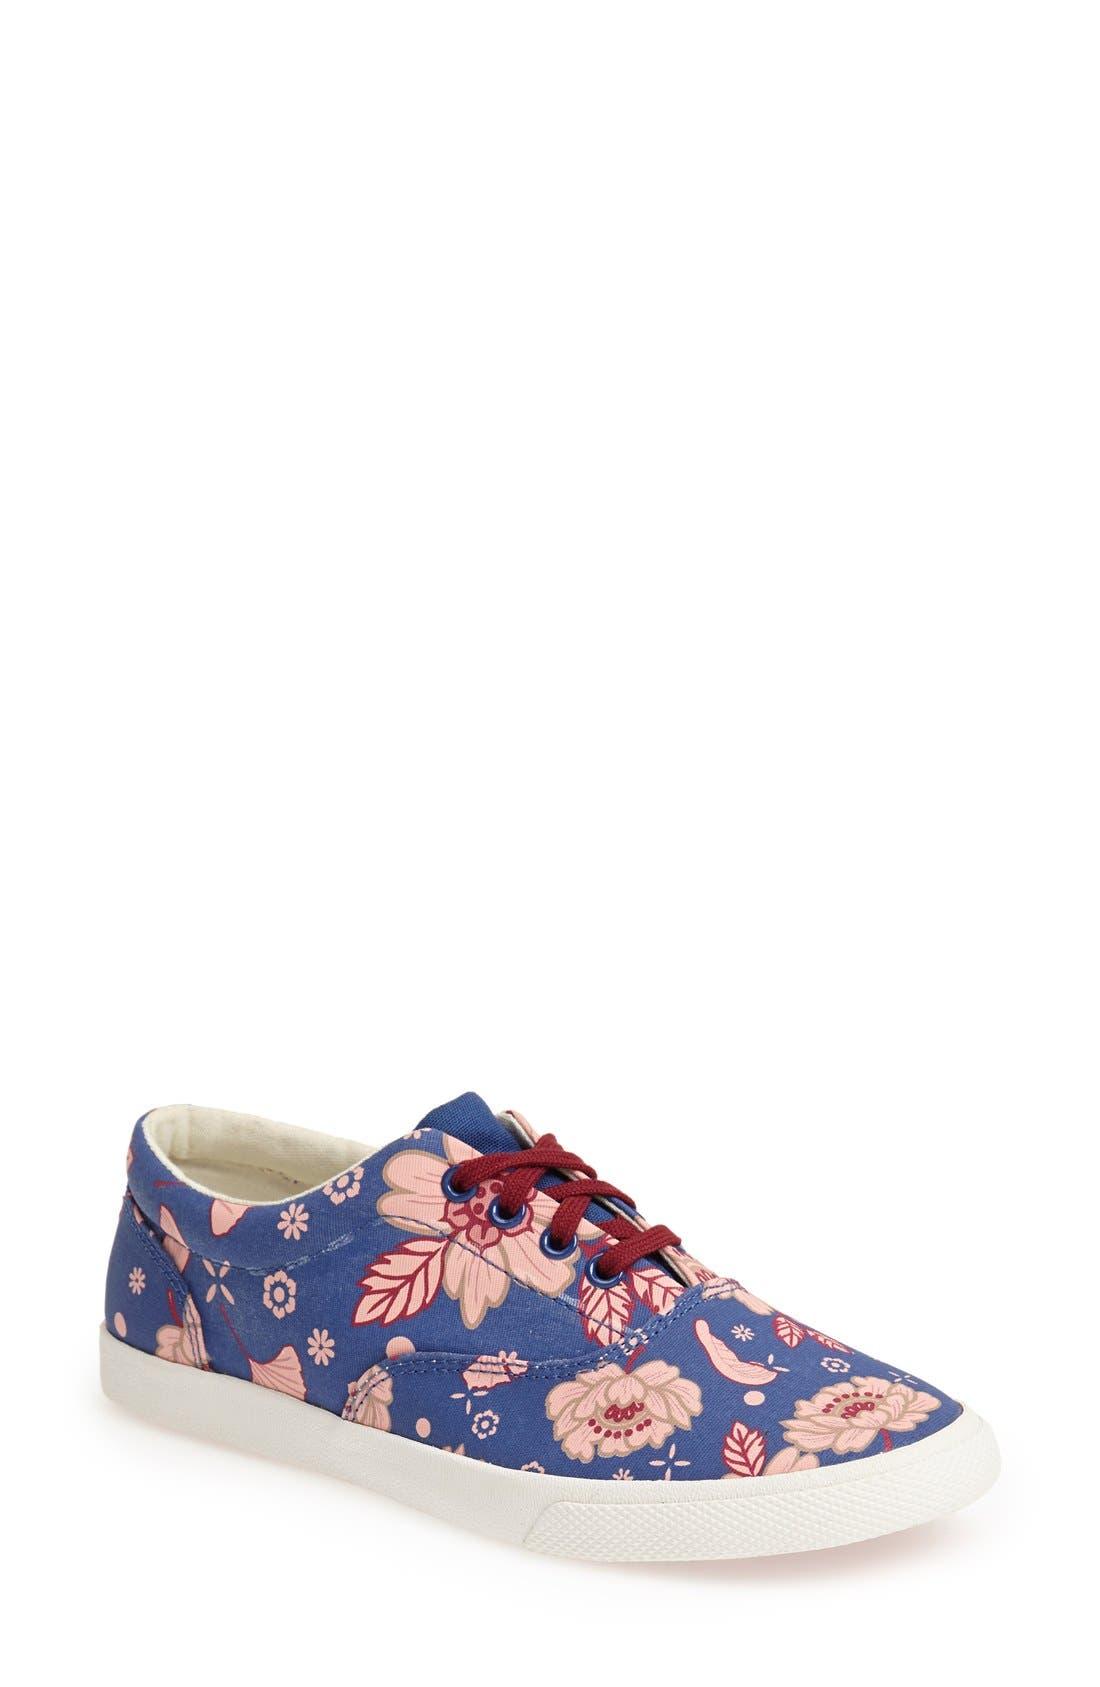 Alternate Image 1 Selected - BucketFeet 'Blue East' Print Sneaker (Women)